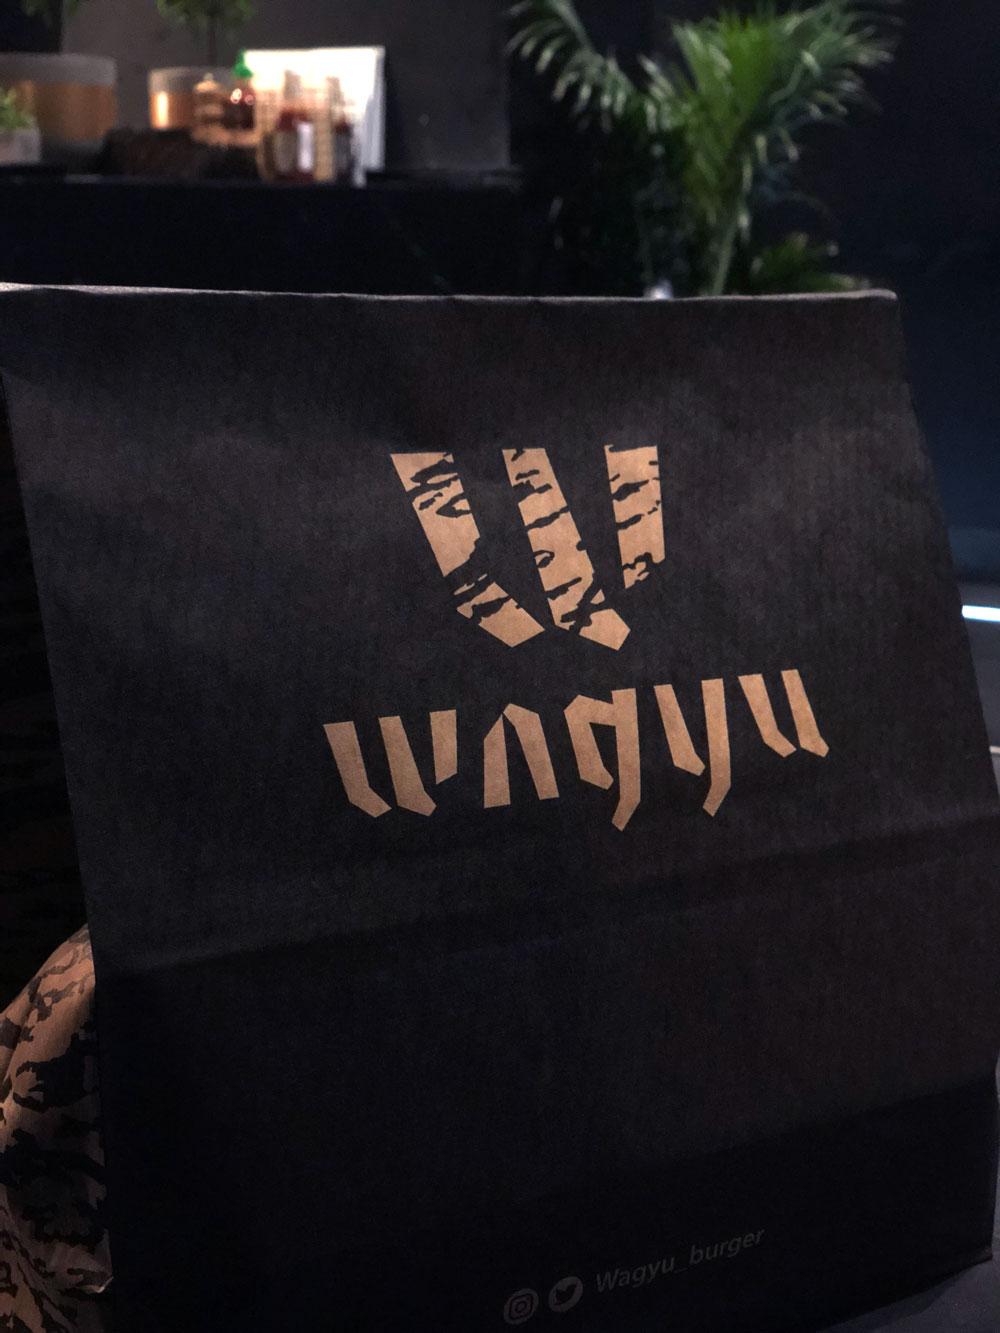 Wagyu-Work-By-YaStudio-Bag-3